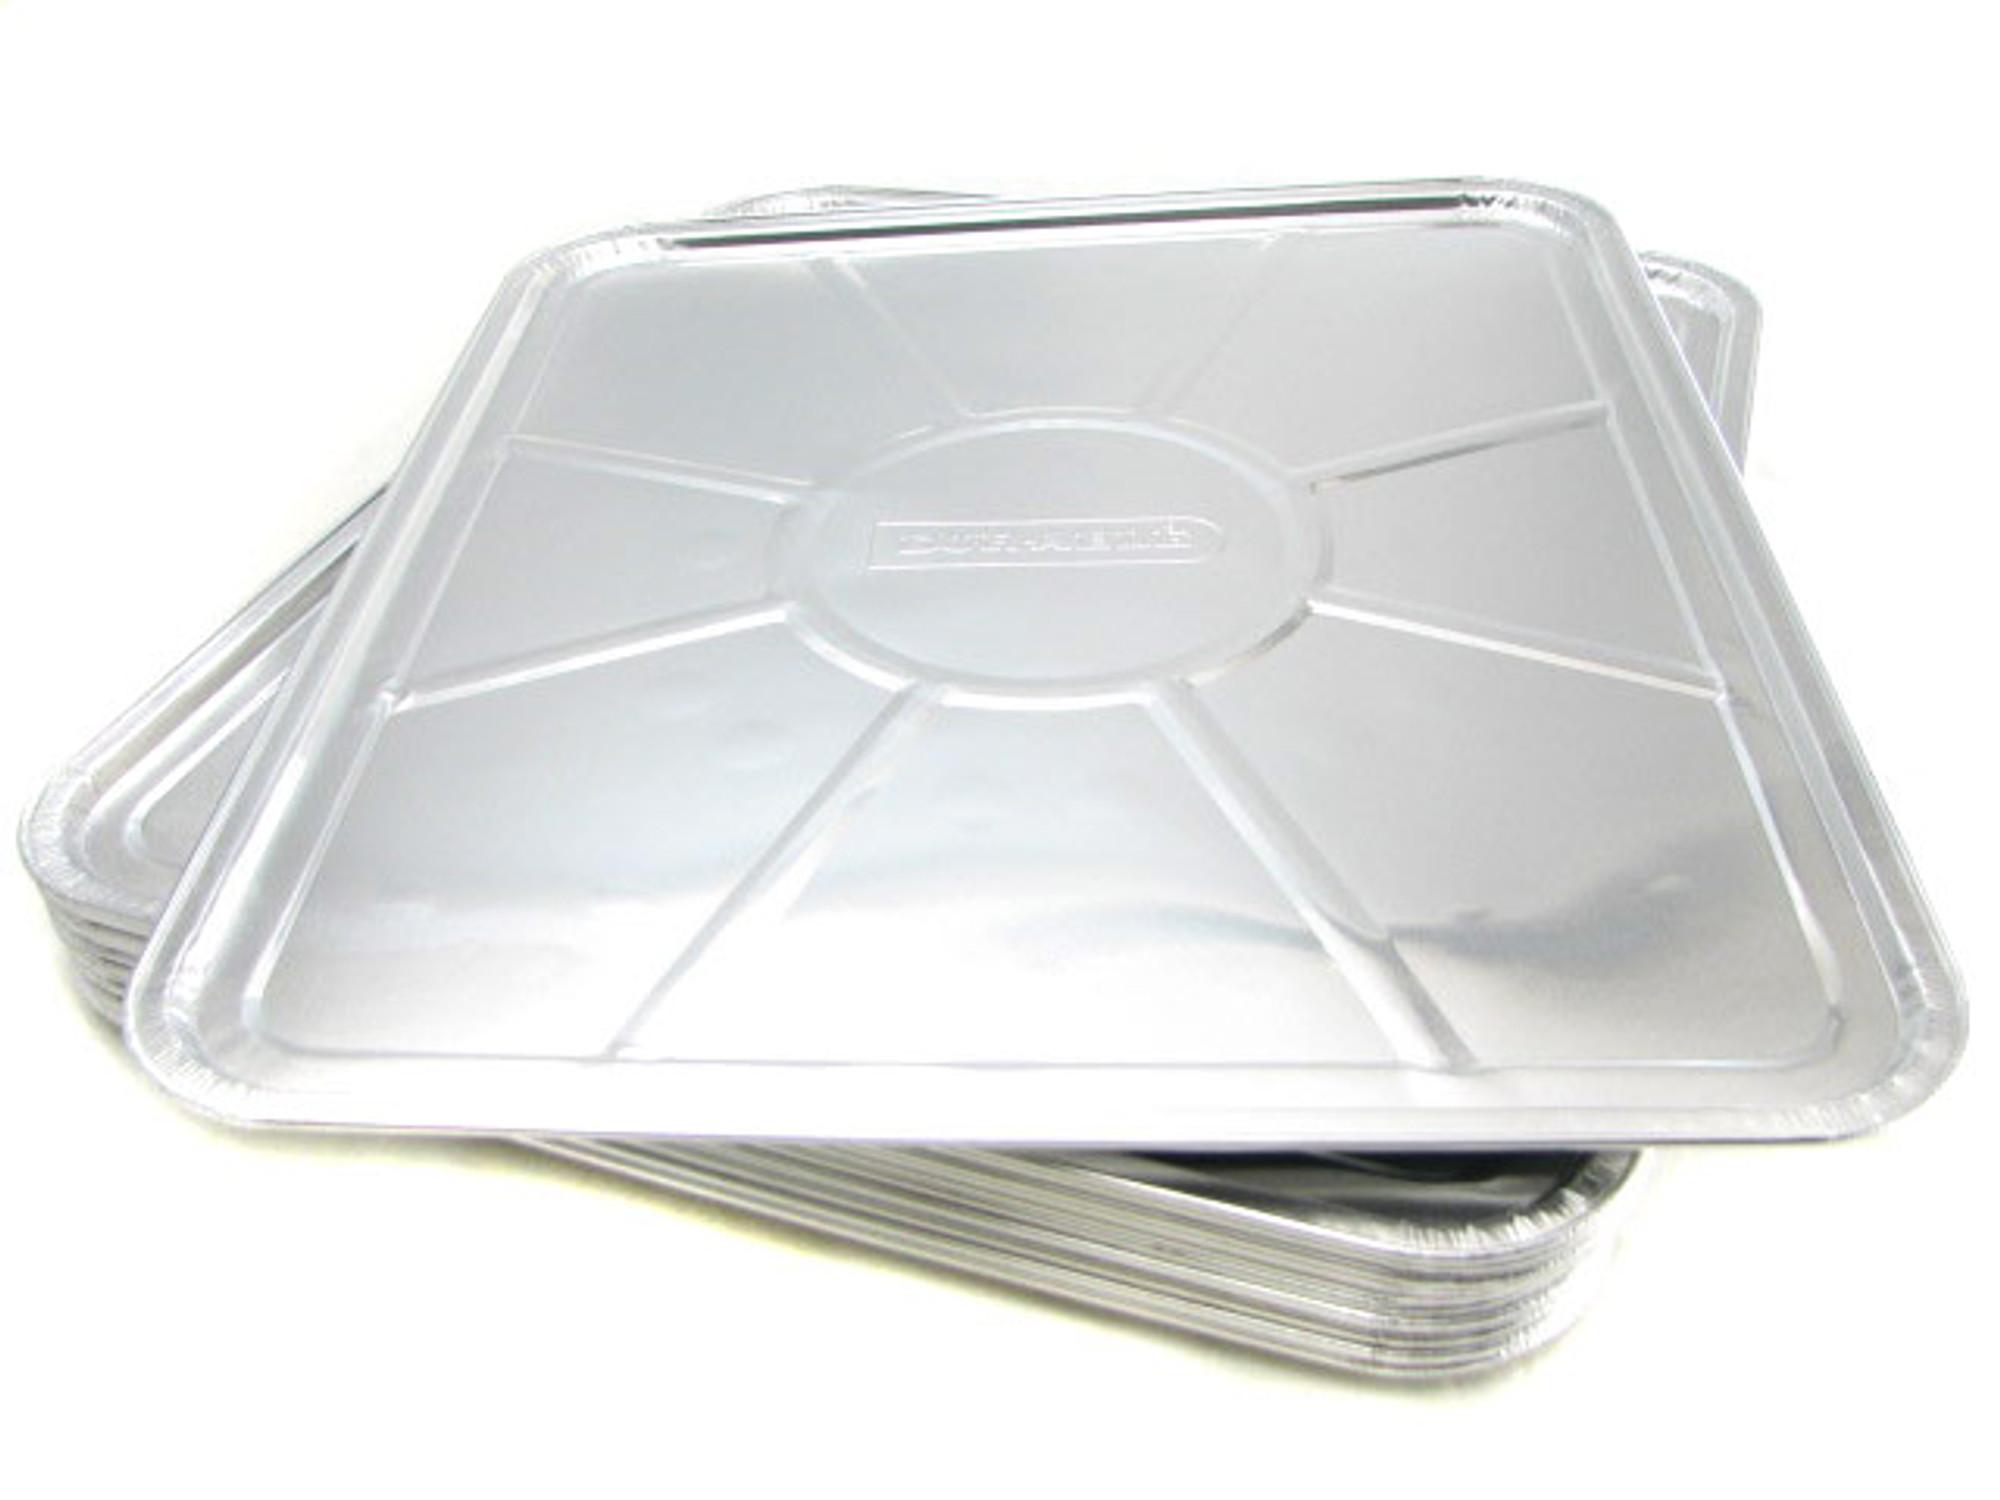 Disposable Aluminum Foil Oven Liners